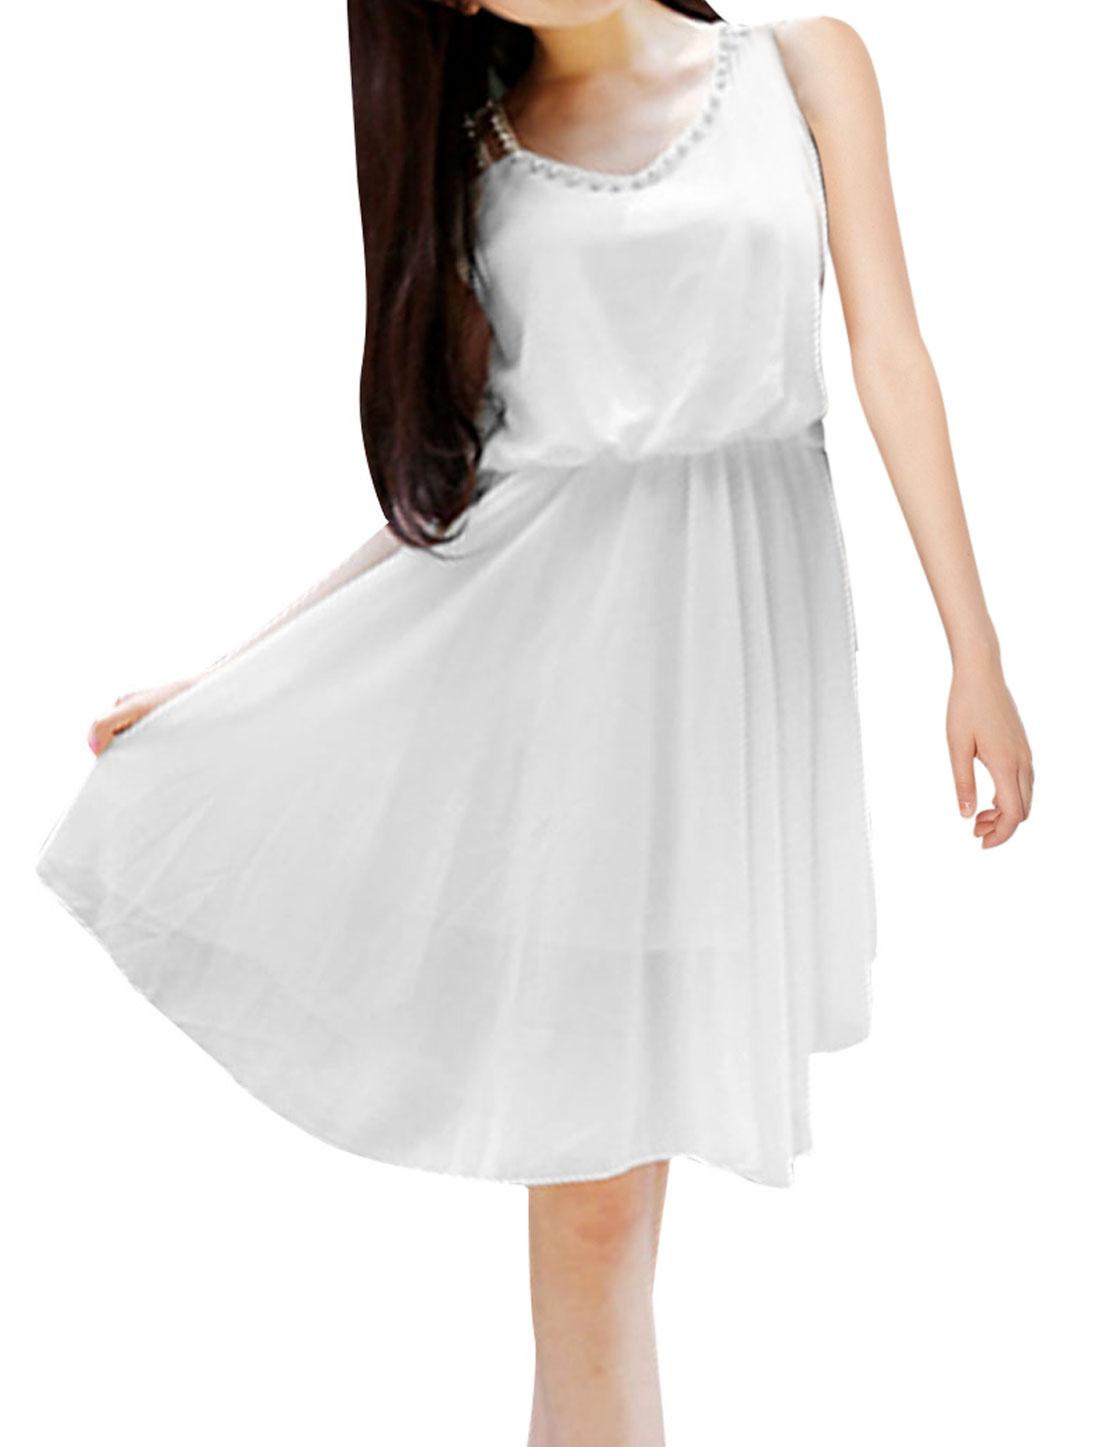 Ladies V Neck Pullover Sleeveless Rhinestone Decor Dress White XS